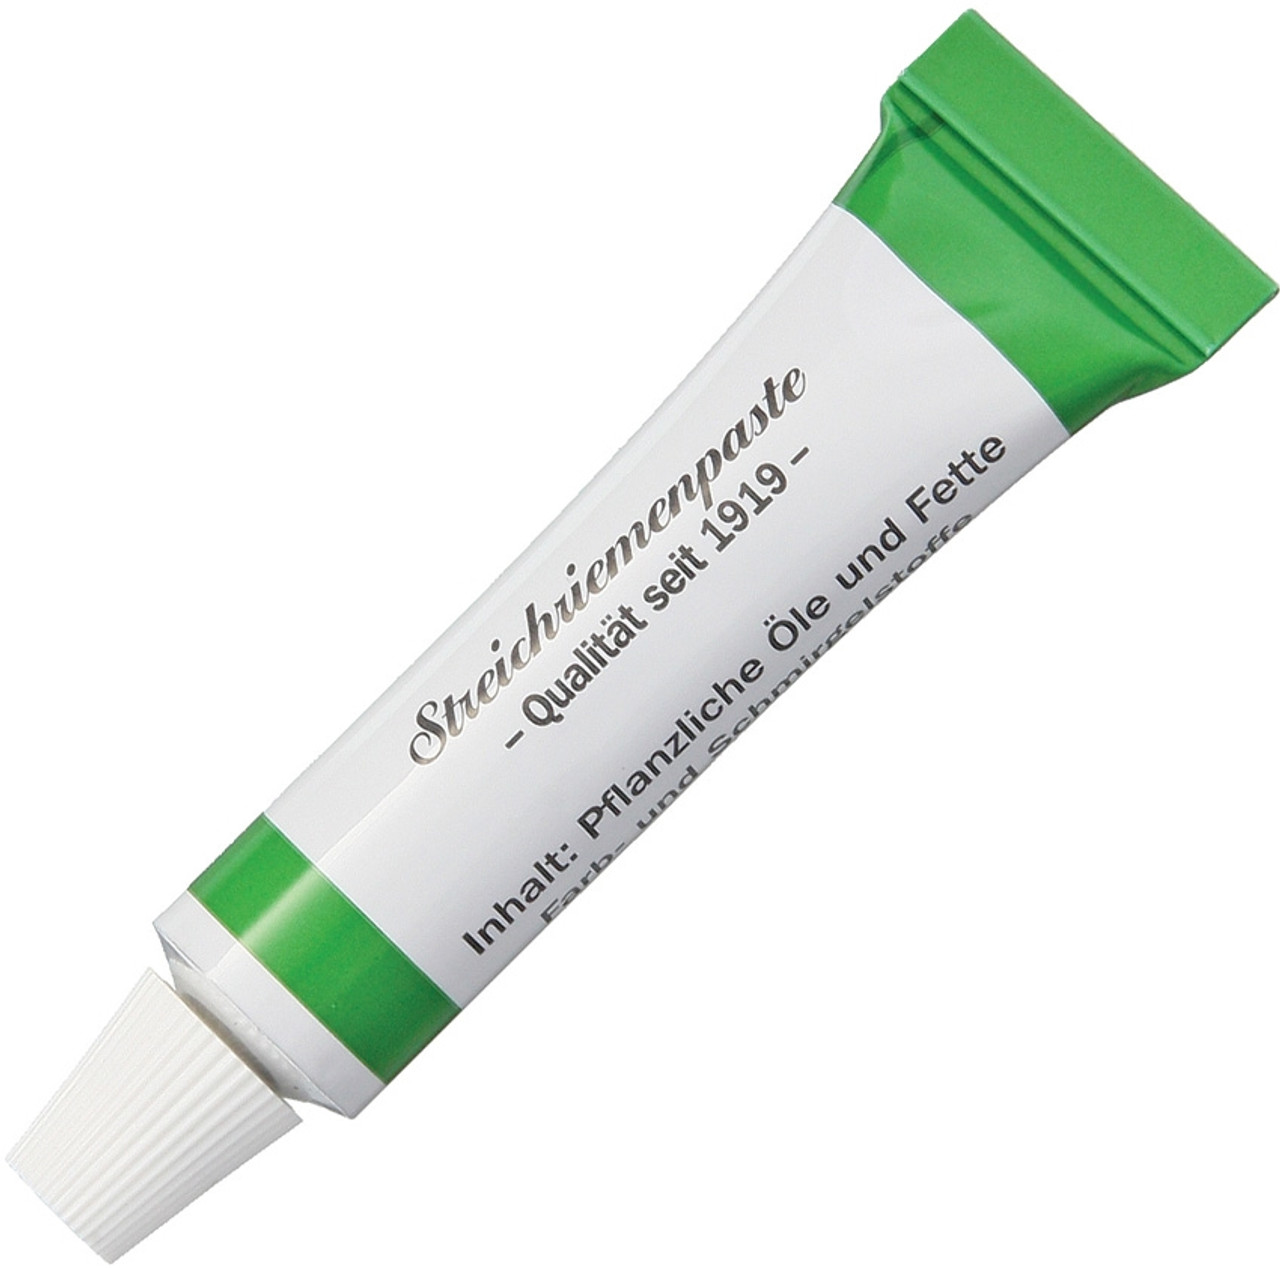 Herold Solingen Tubenpaste for Razor Strops, Green Paste Coarse Grid Effect